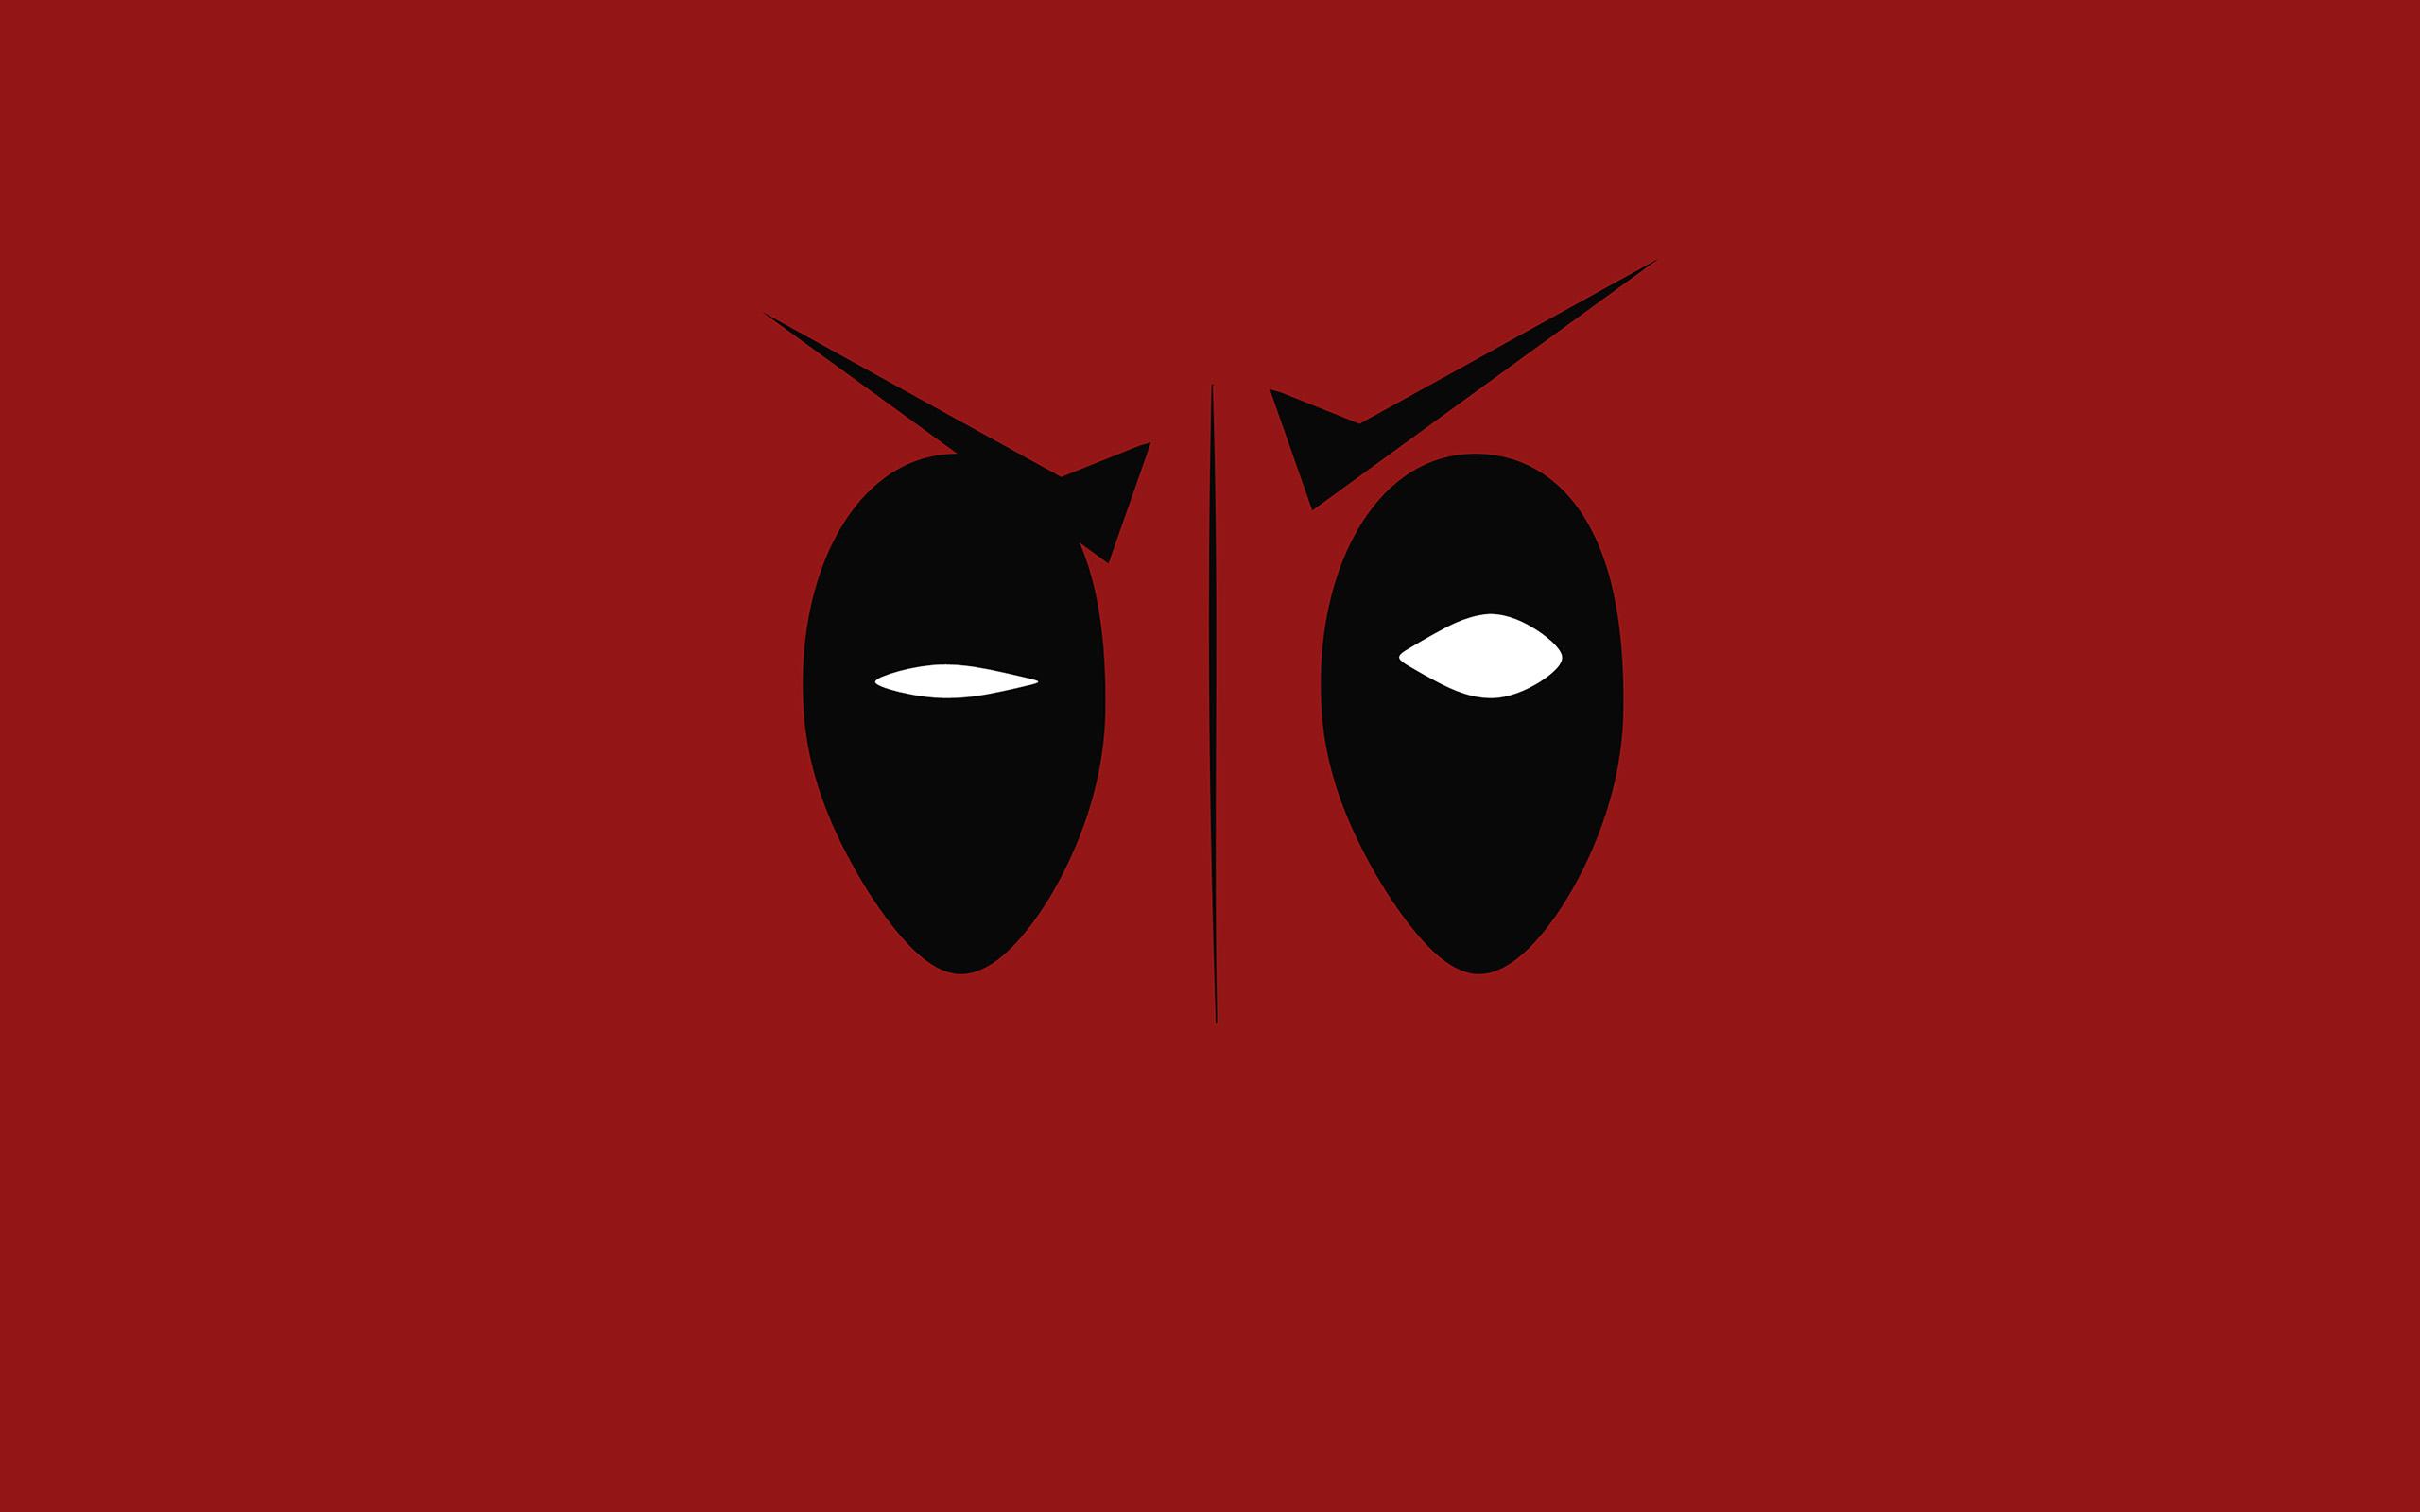 Lebron James Iphone Wallpaper Ap59 Deadpool Hero Eye Logo Art Film Wallpaper